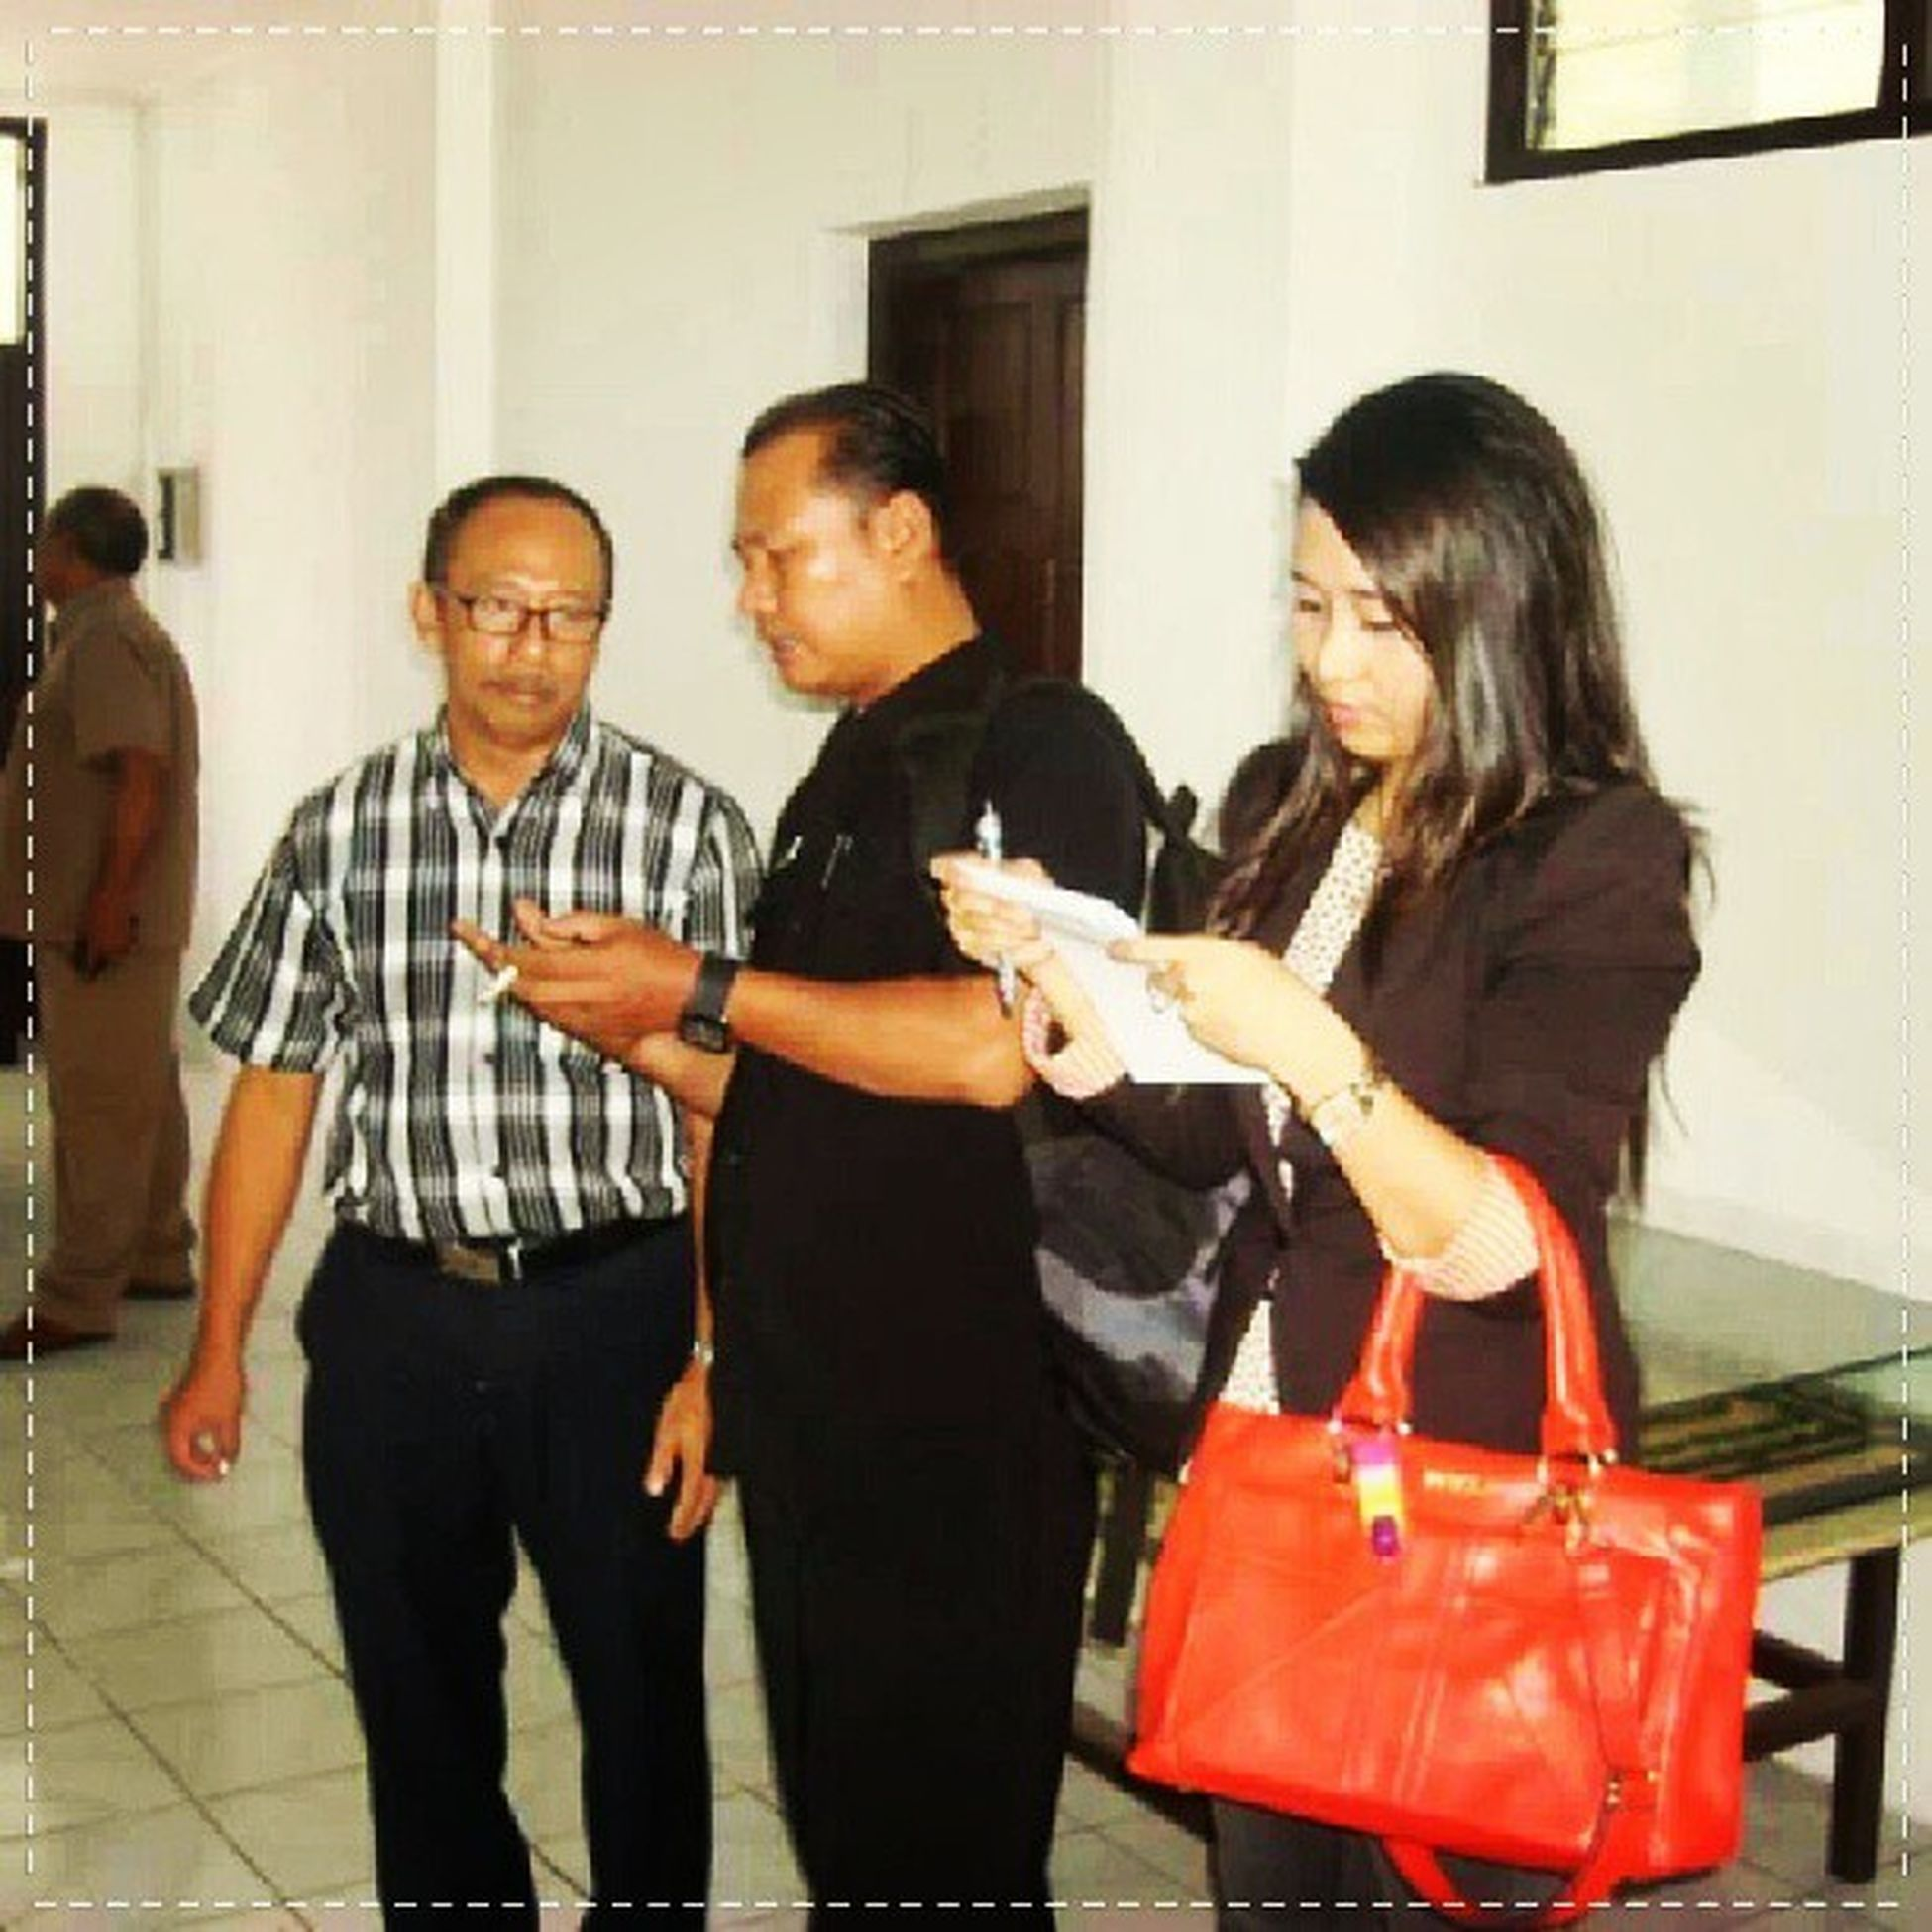 After Rapat Pengurus Besar Perbakin Provinsi Kalimantan Tengah 2013-2017 at Gedung KONI Palangkaraya 1 Weeks Ago ..